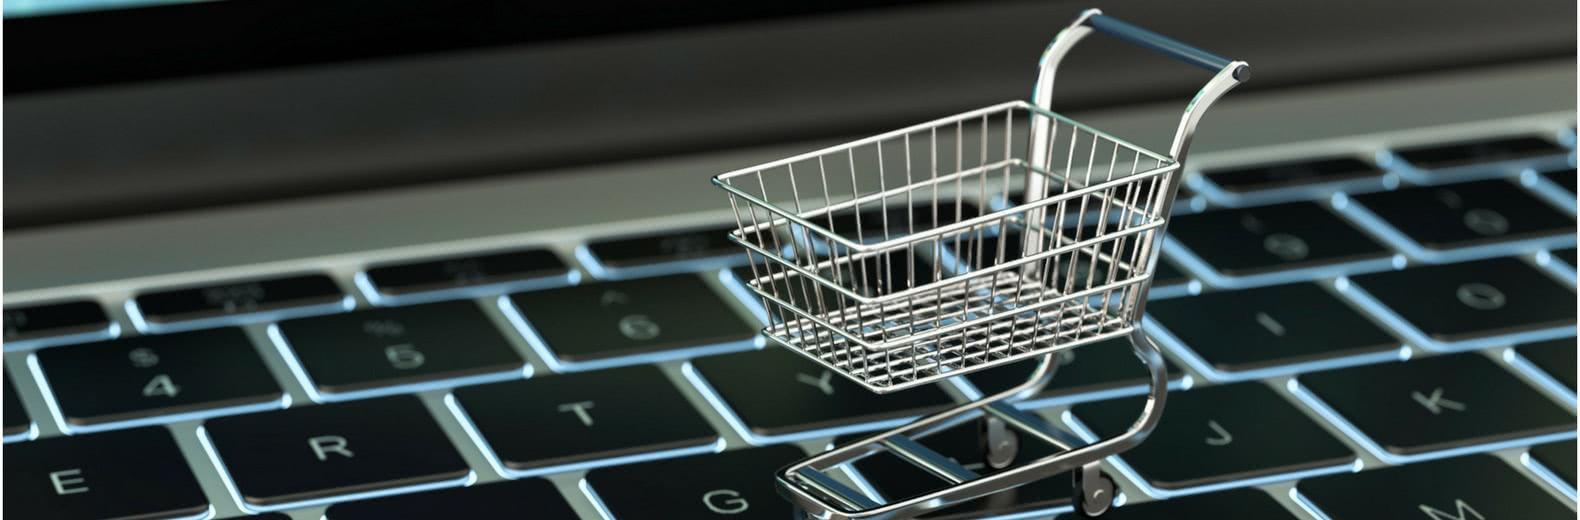 Analiza sklepu internetowego: smartfonmedia.com